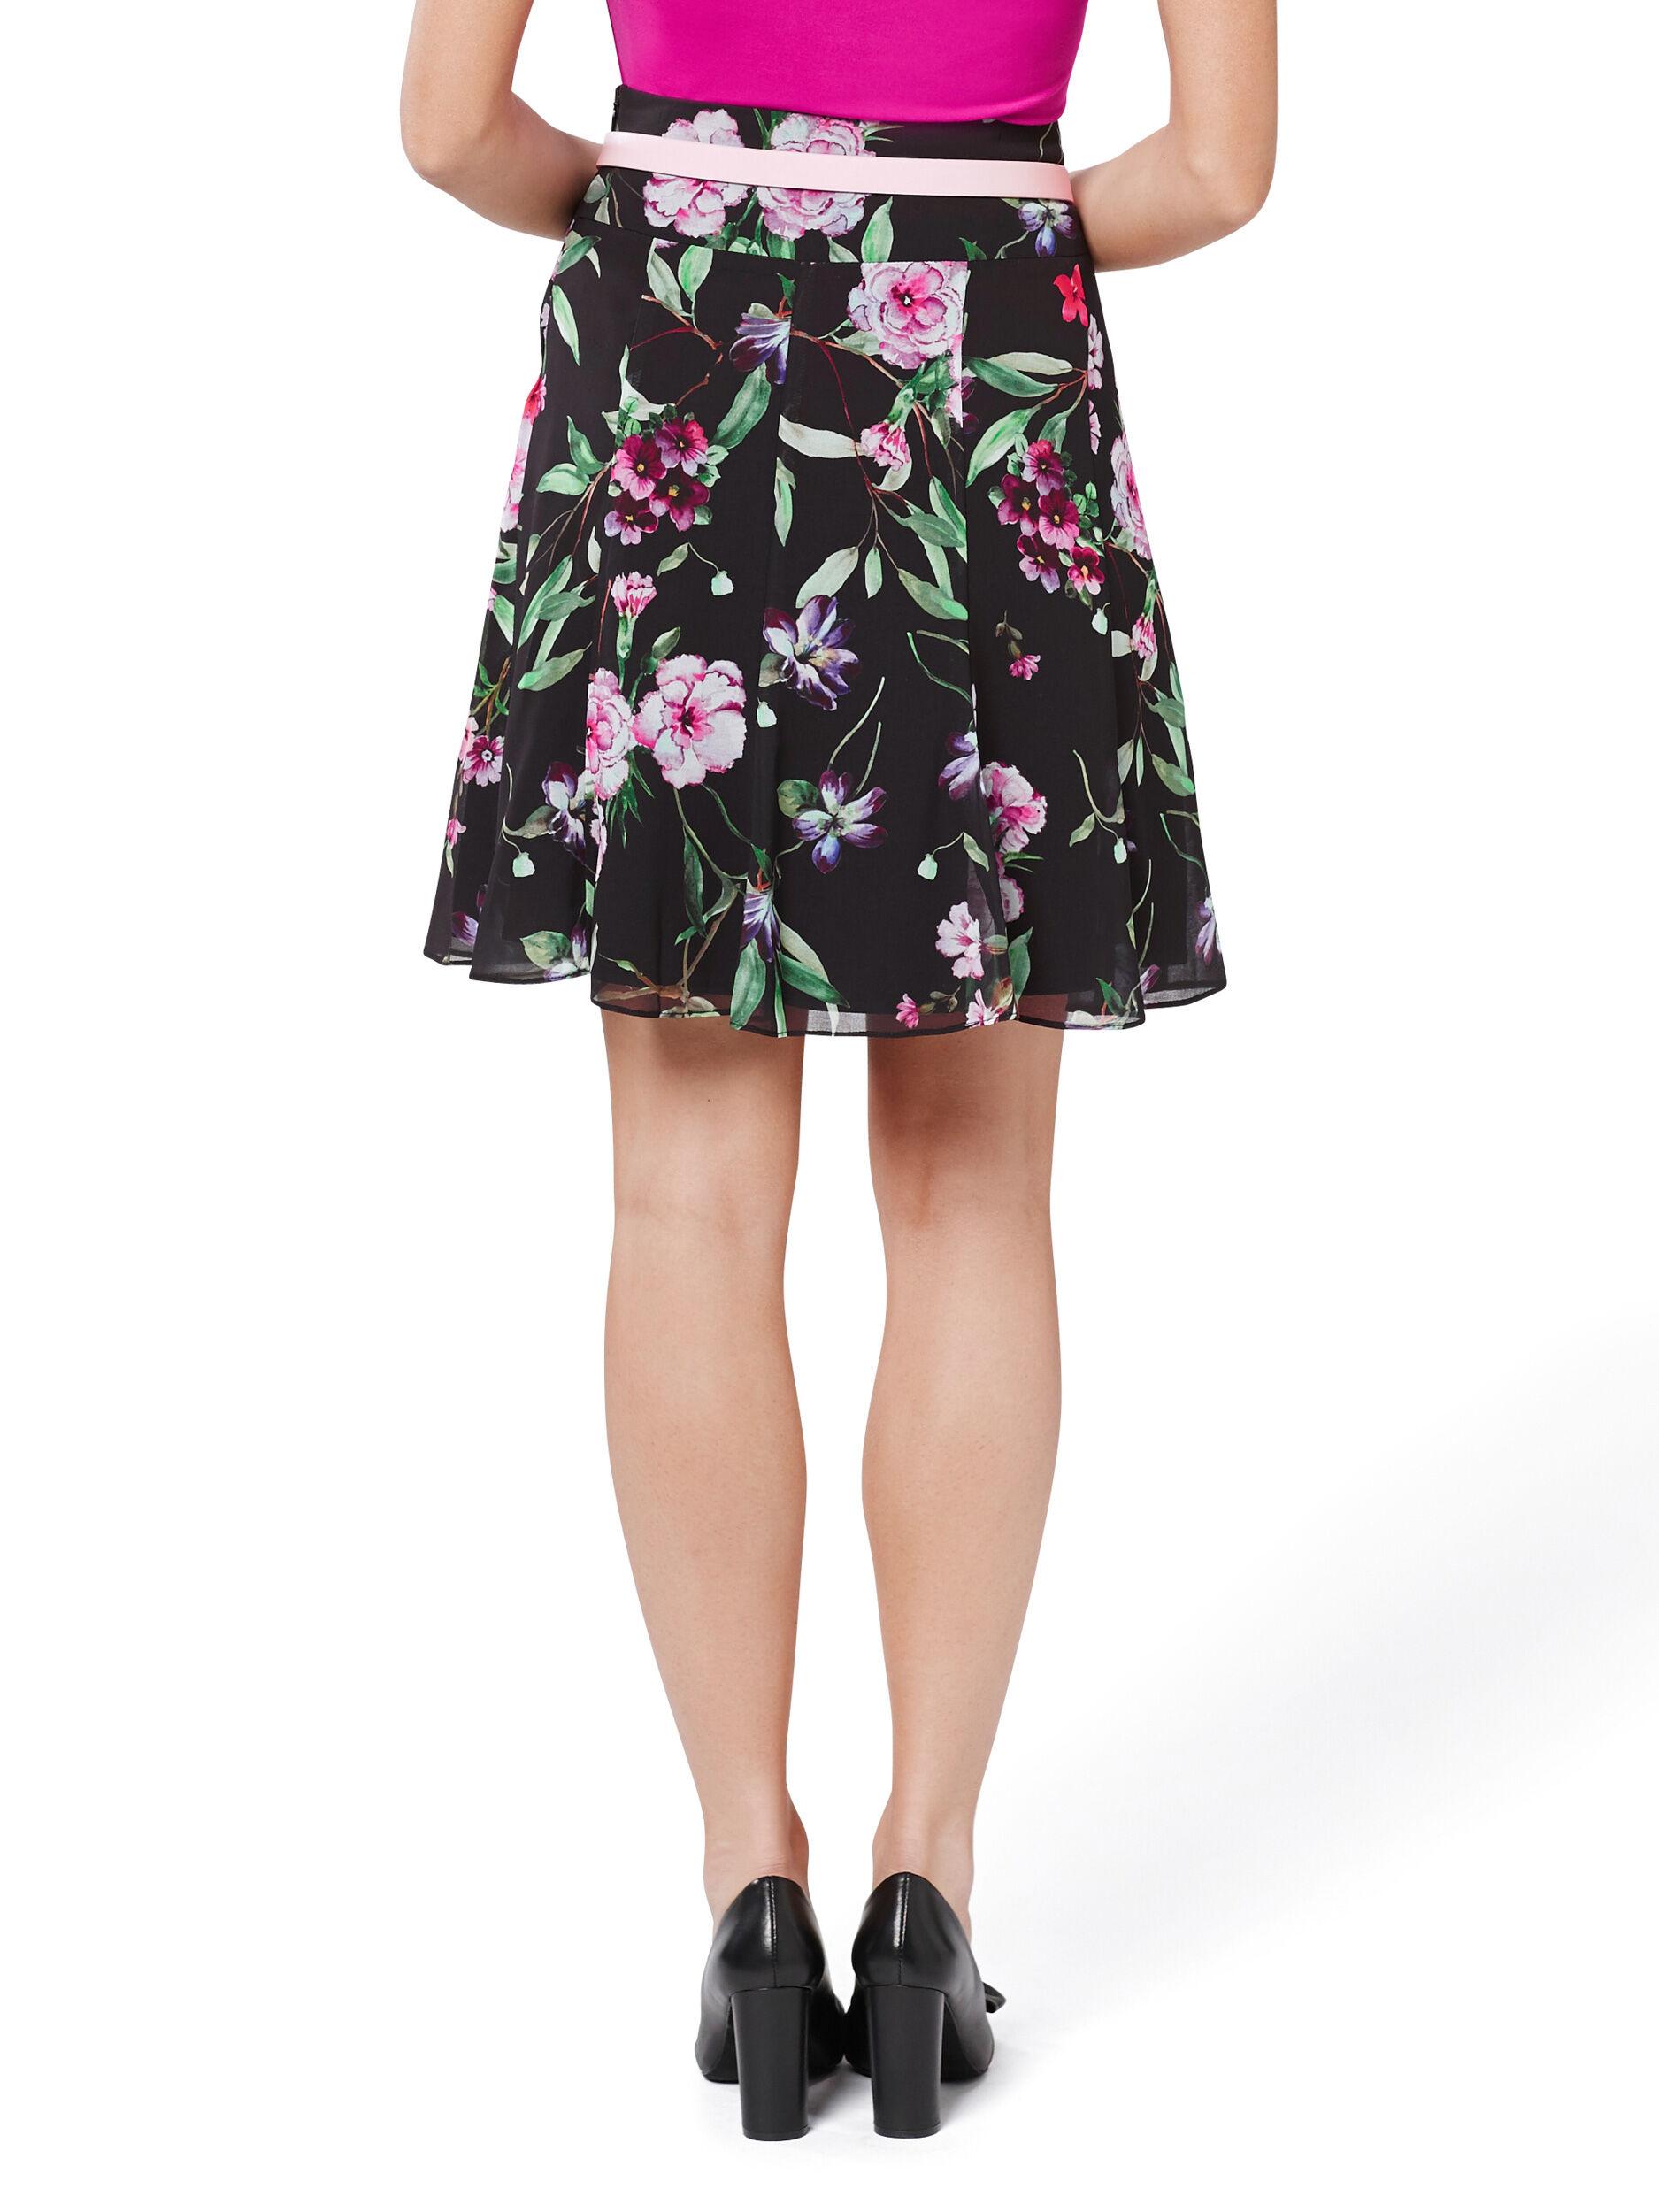 Wild Pixie Skirt